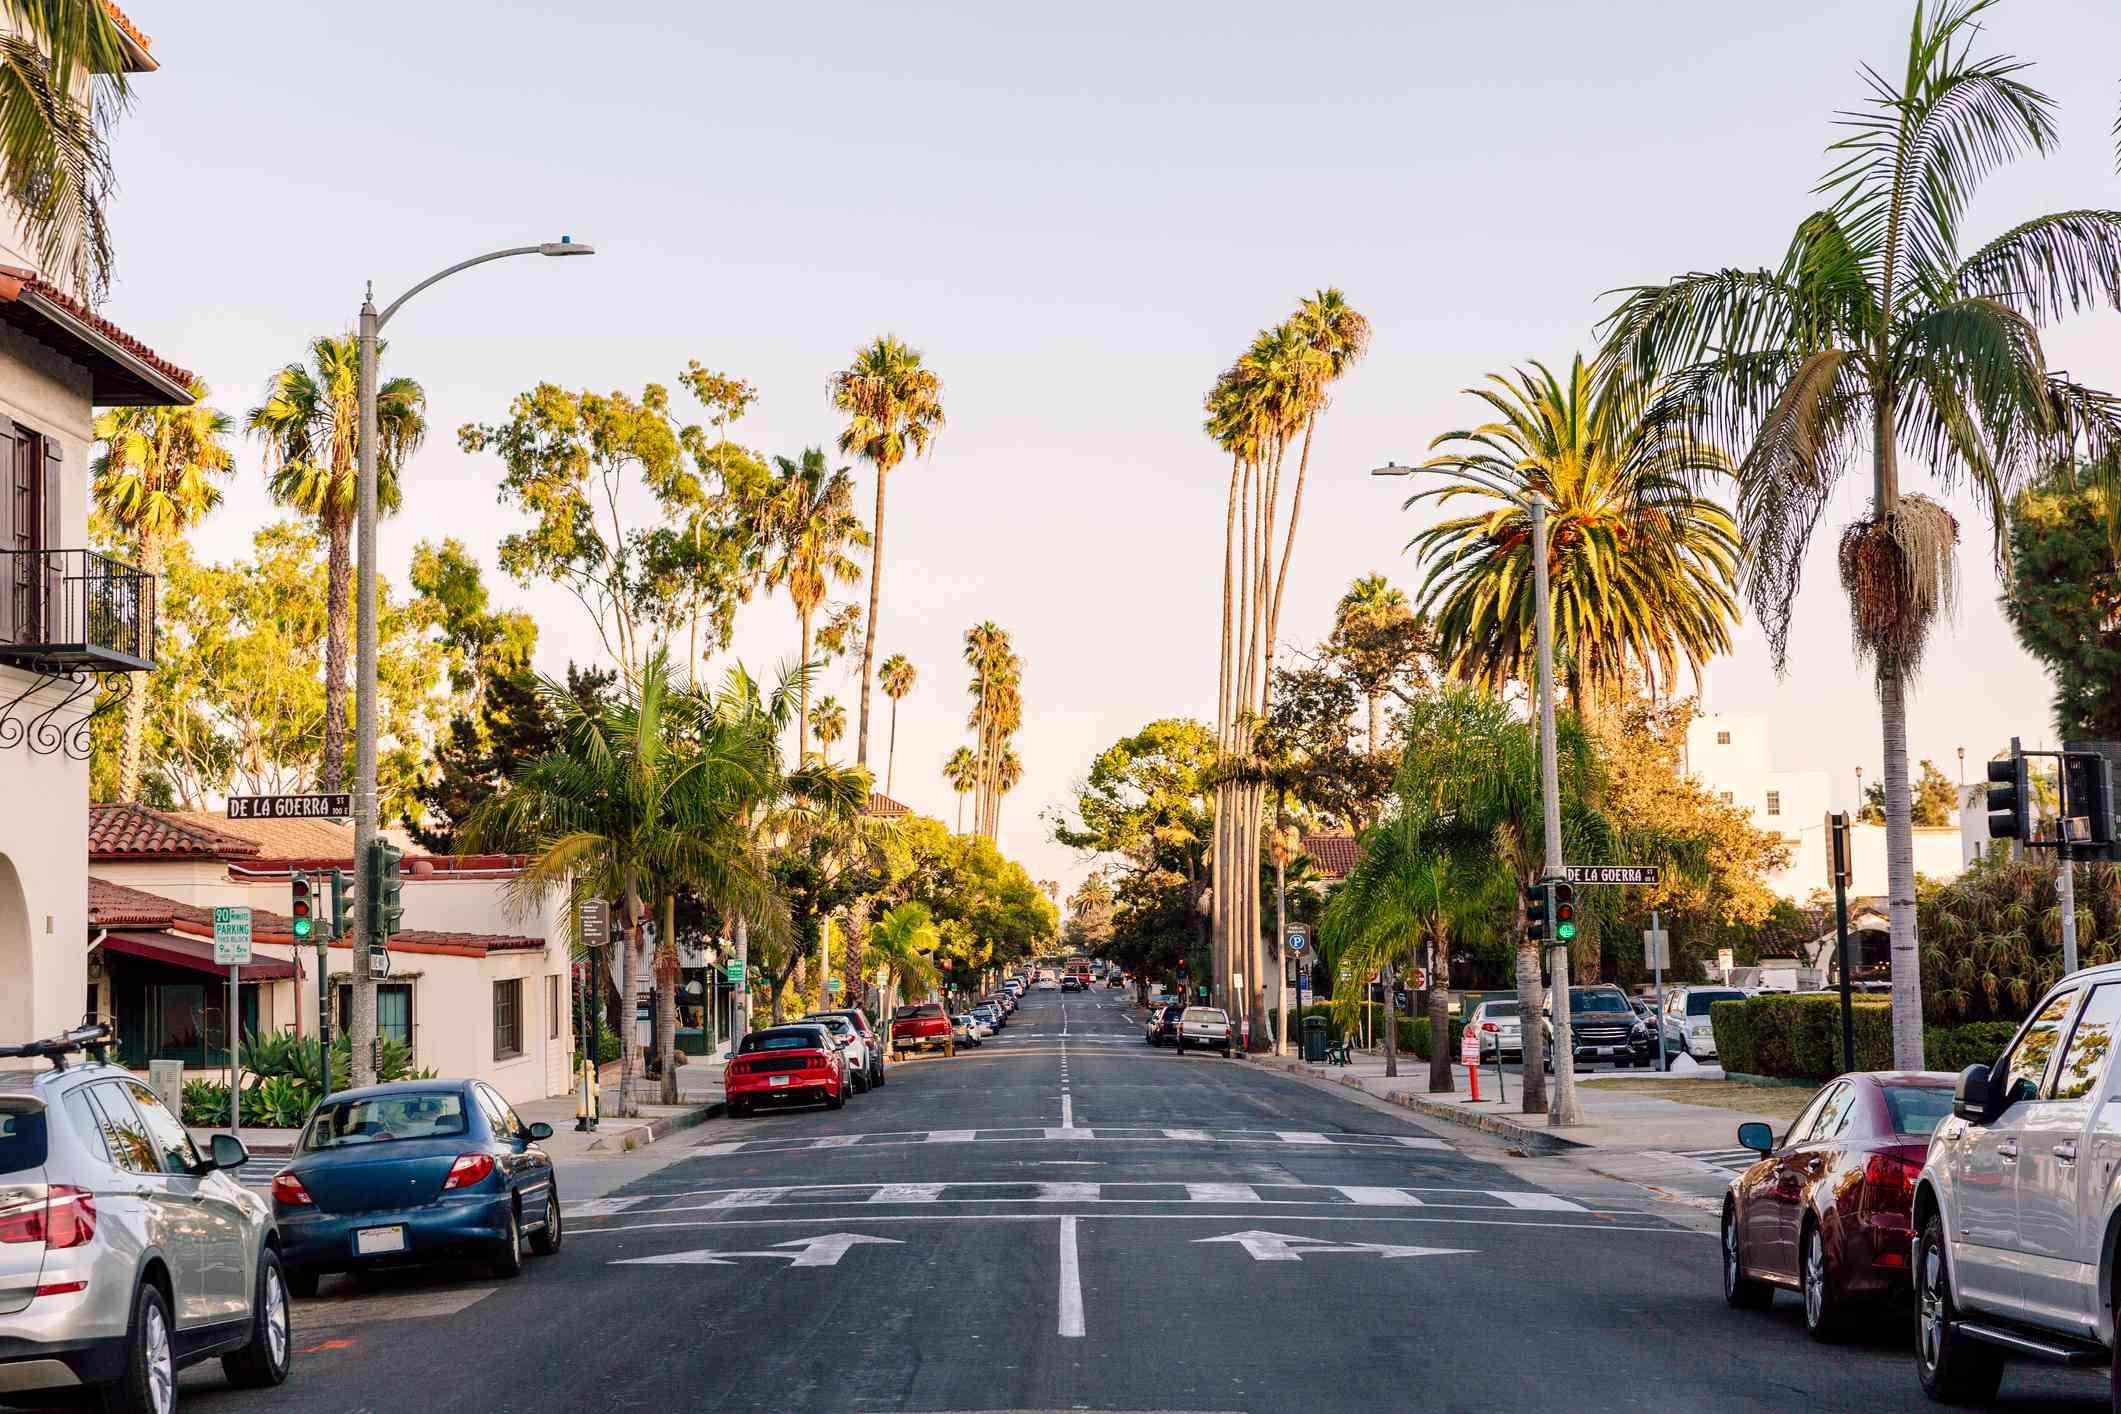 car-lined street in Santa Barbara while sun is setting